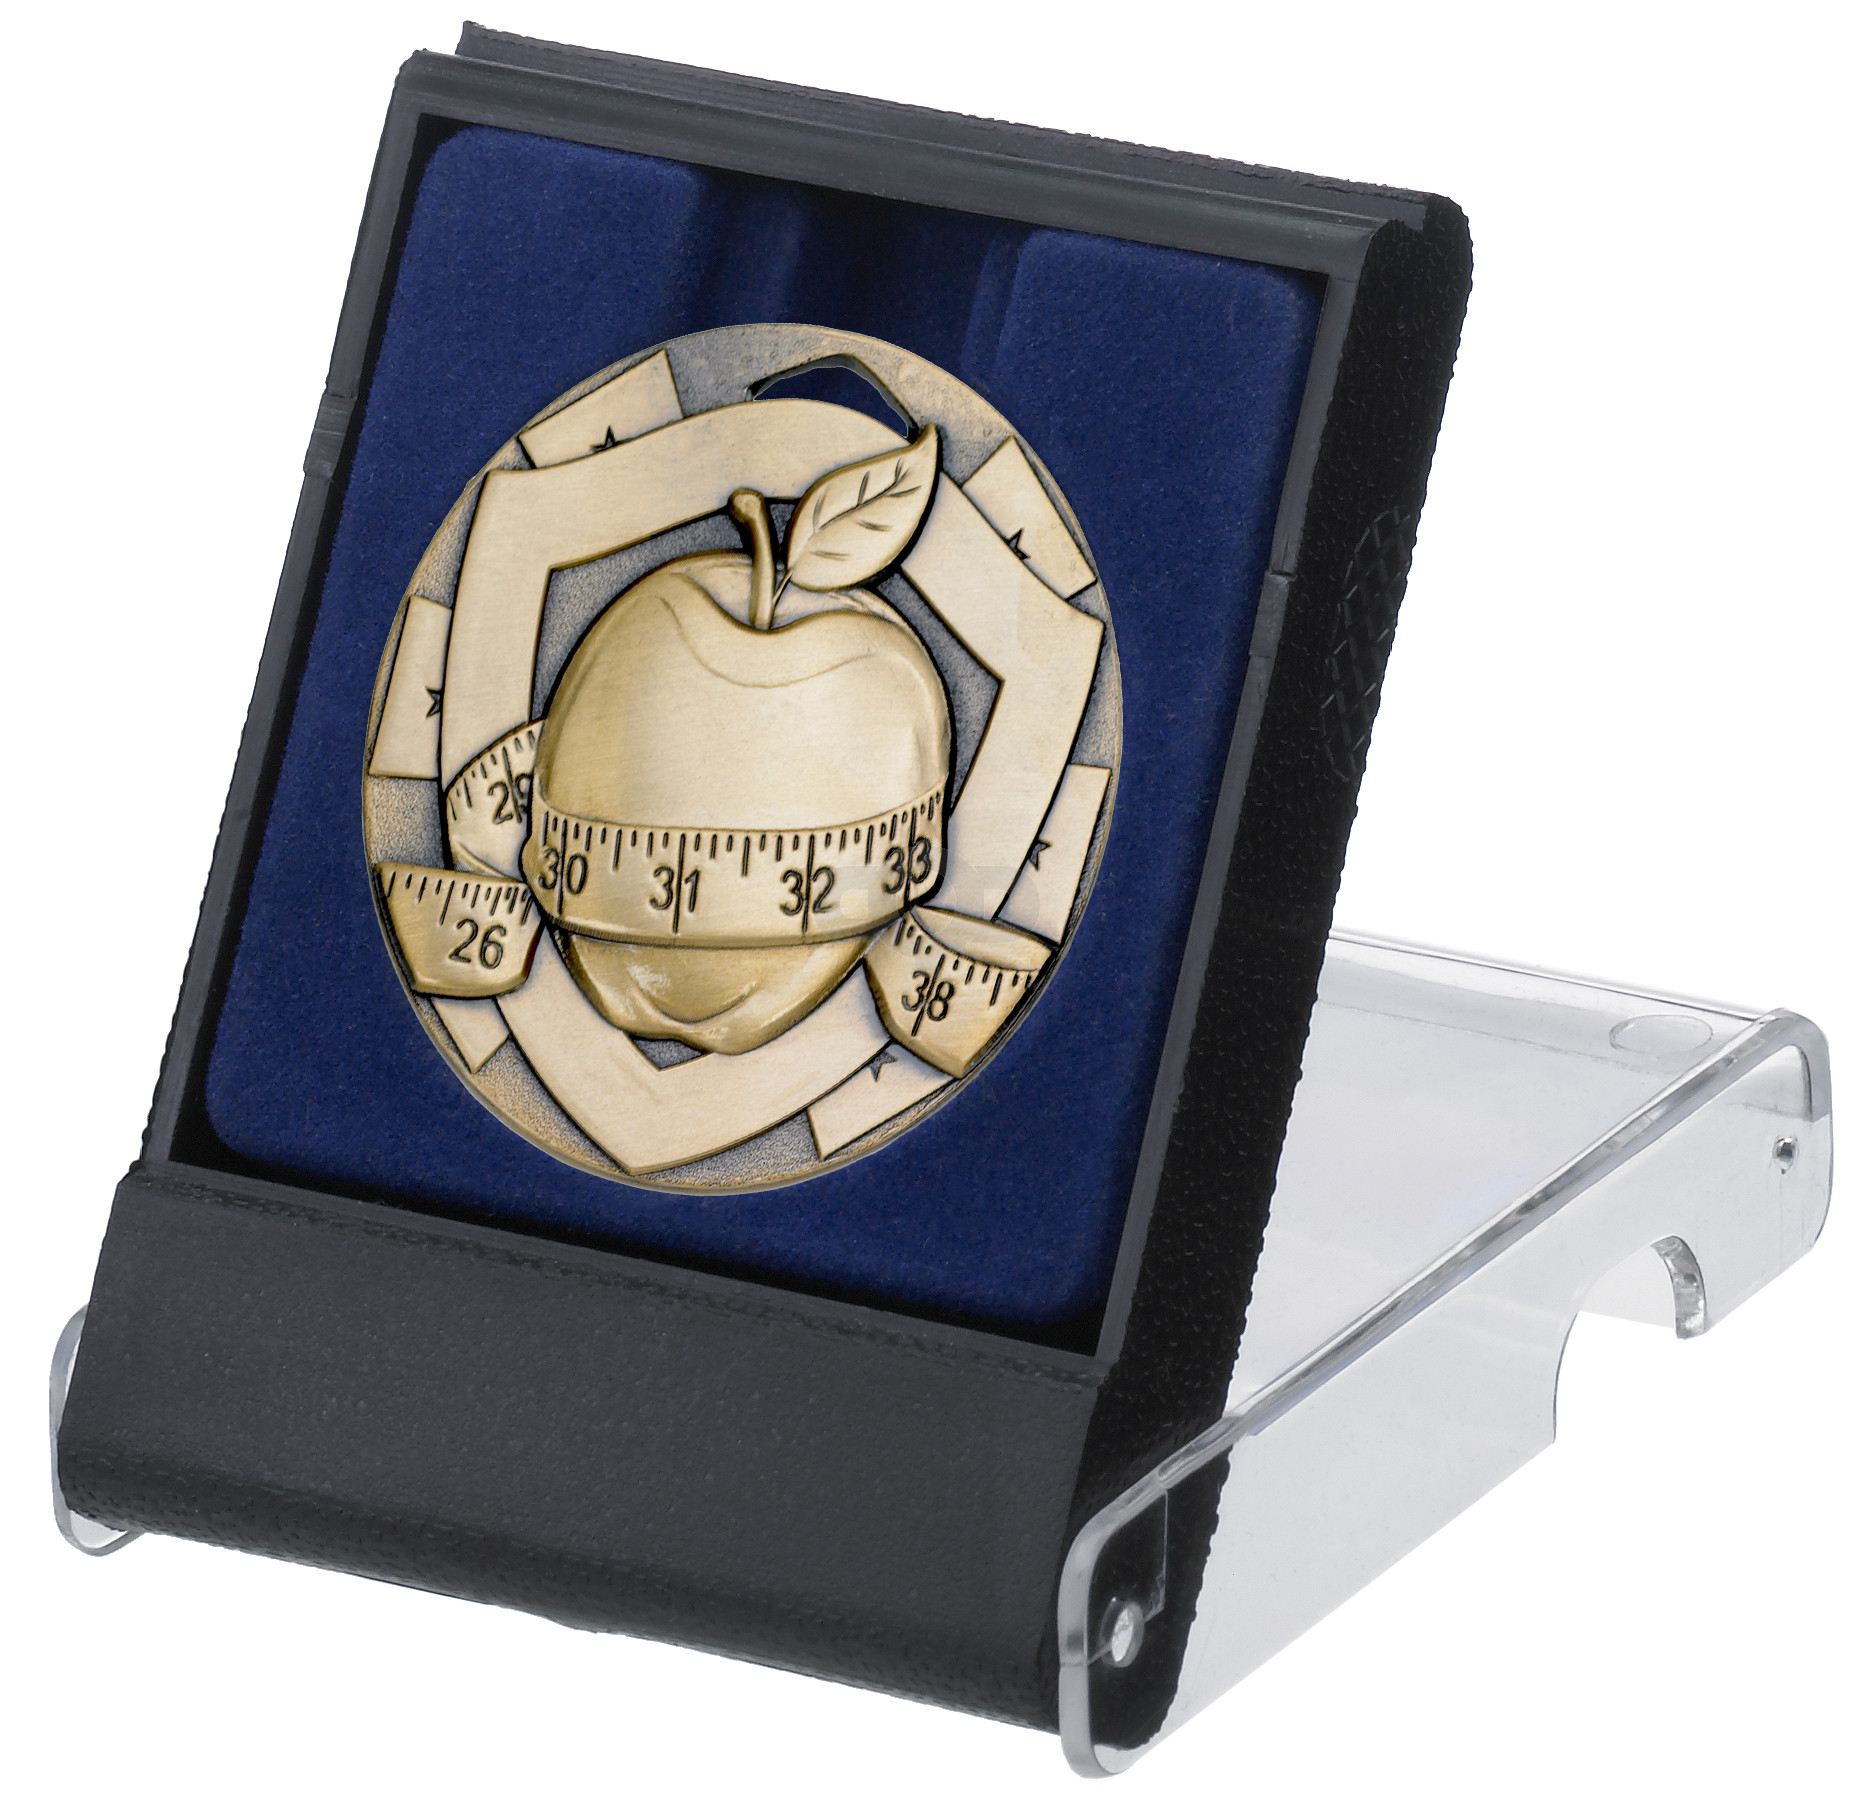 Slimming Medal In Box